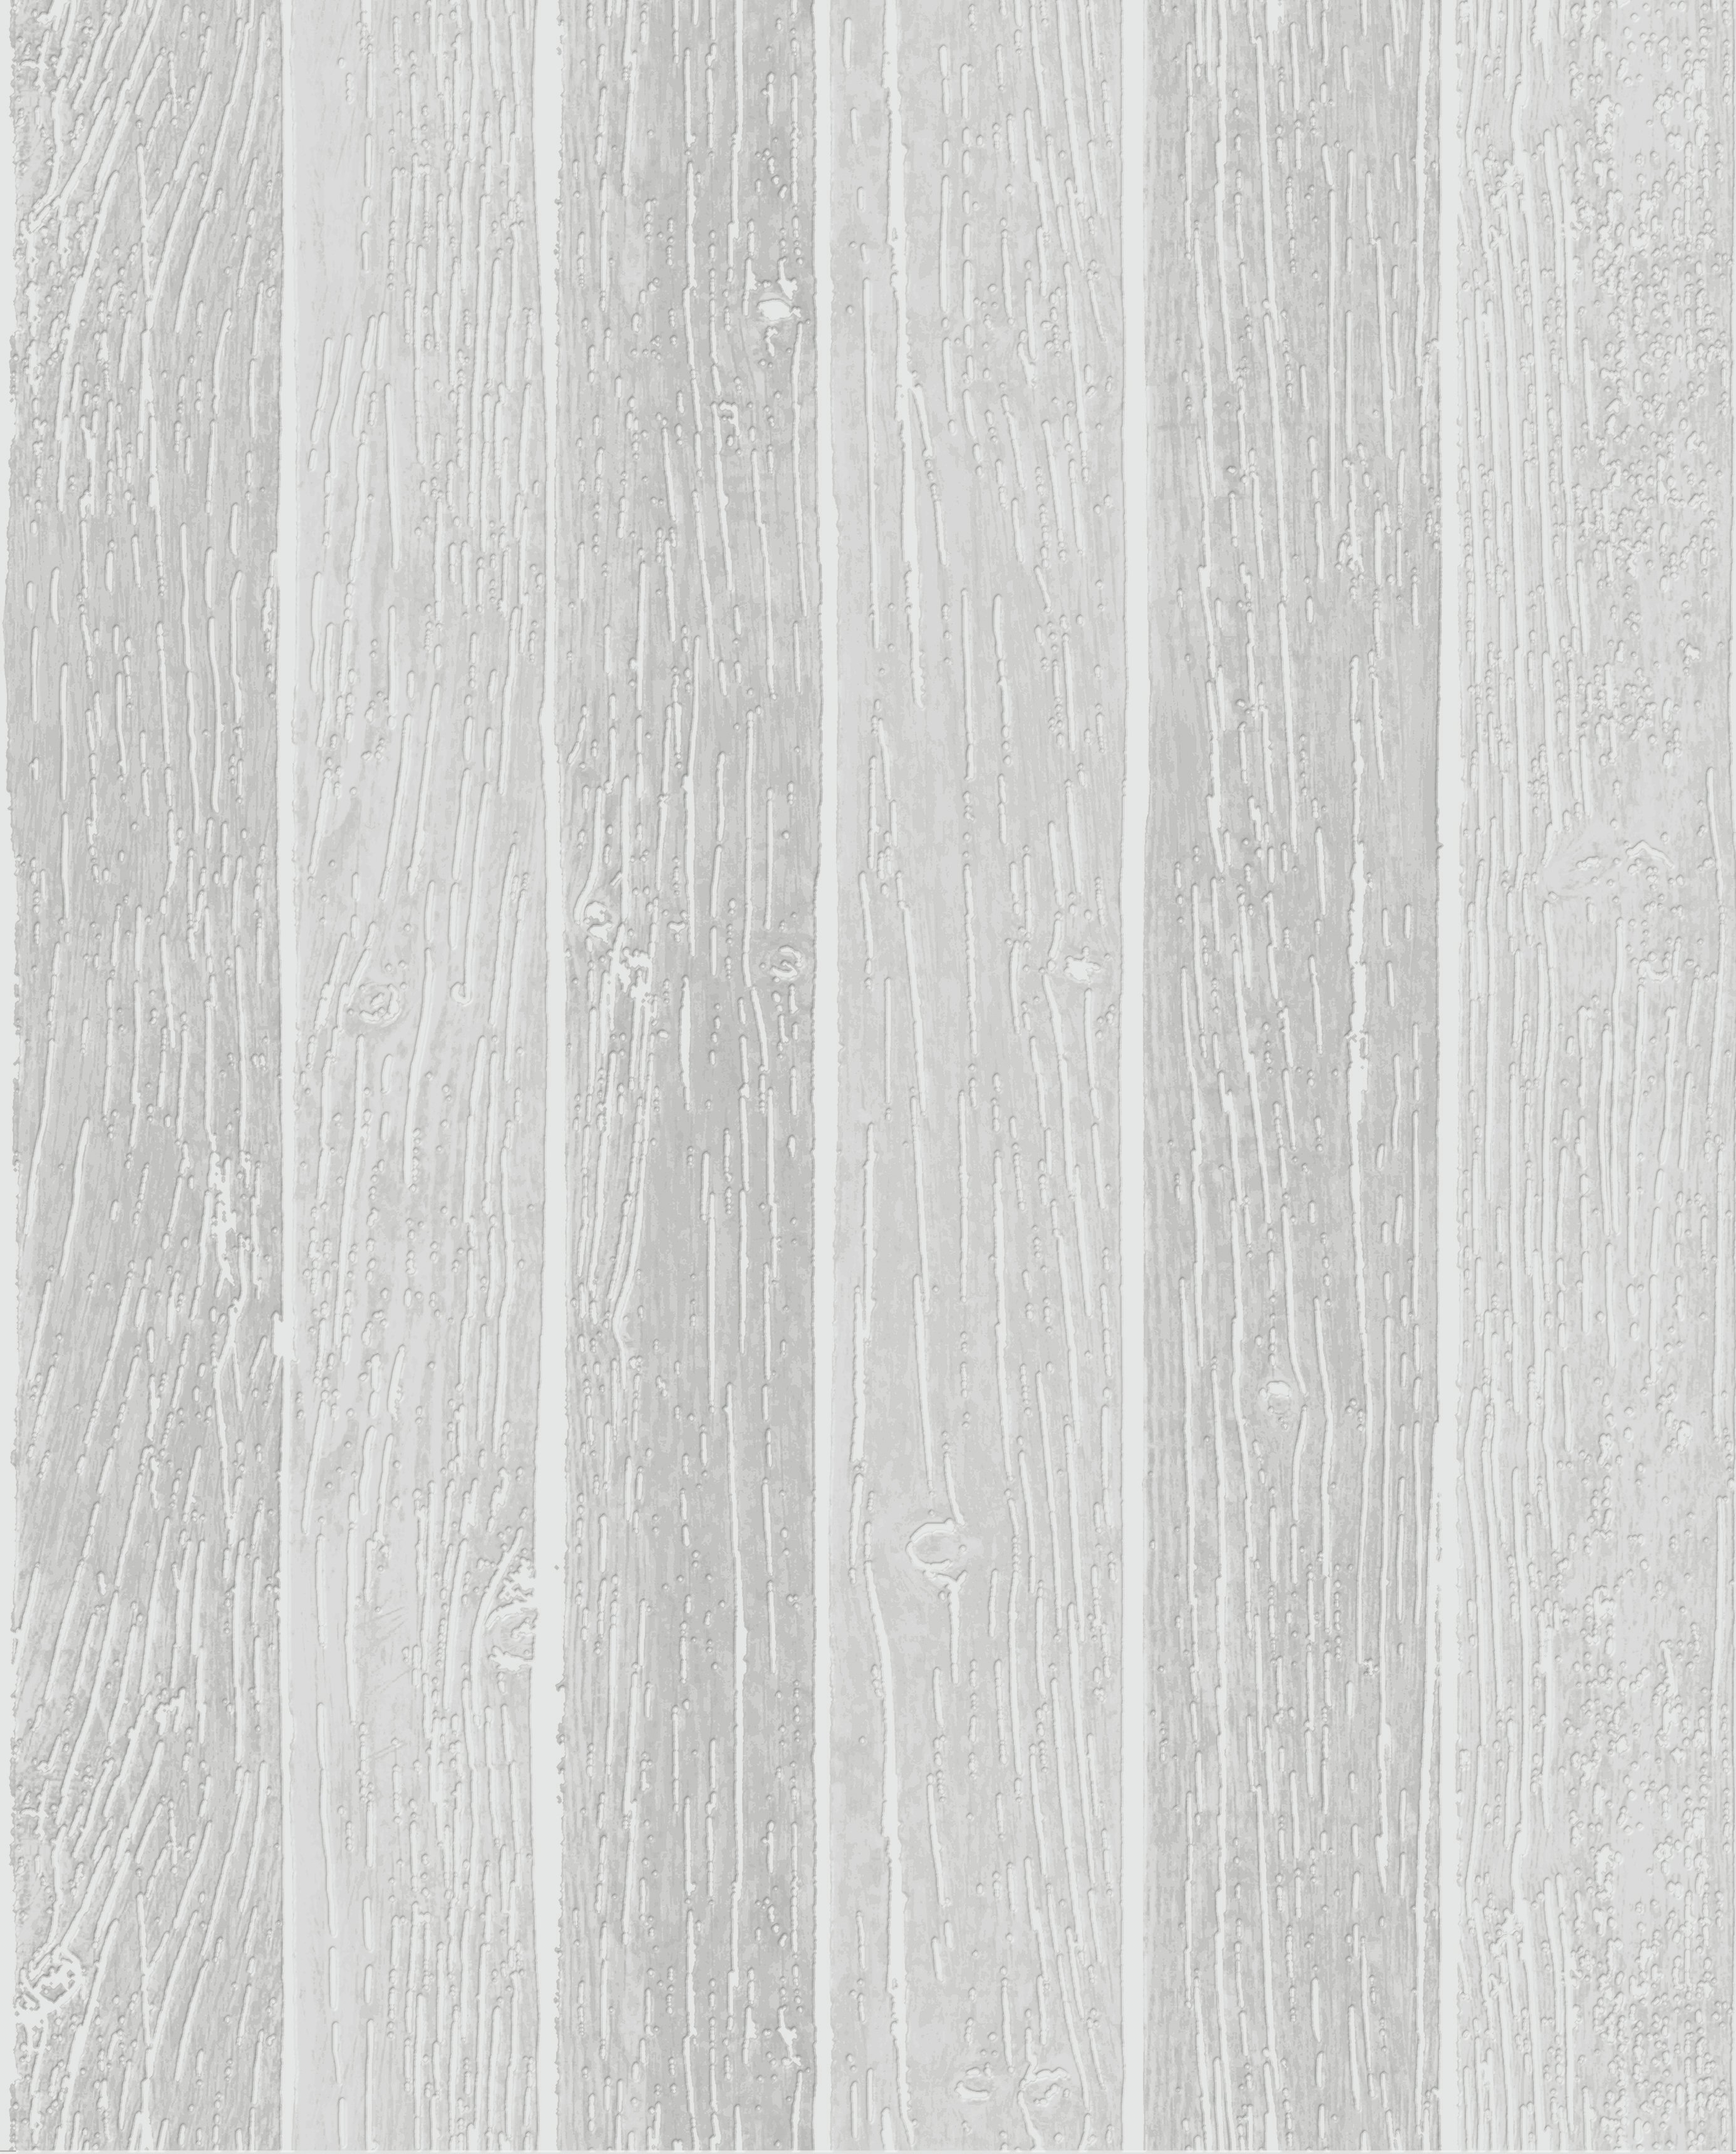 Wood Effect Wallpaper Cheapest Wallpaper Uk